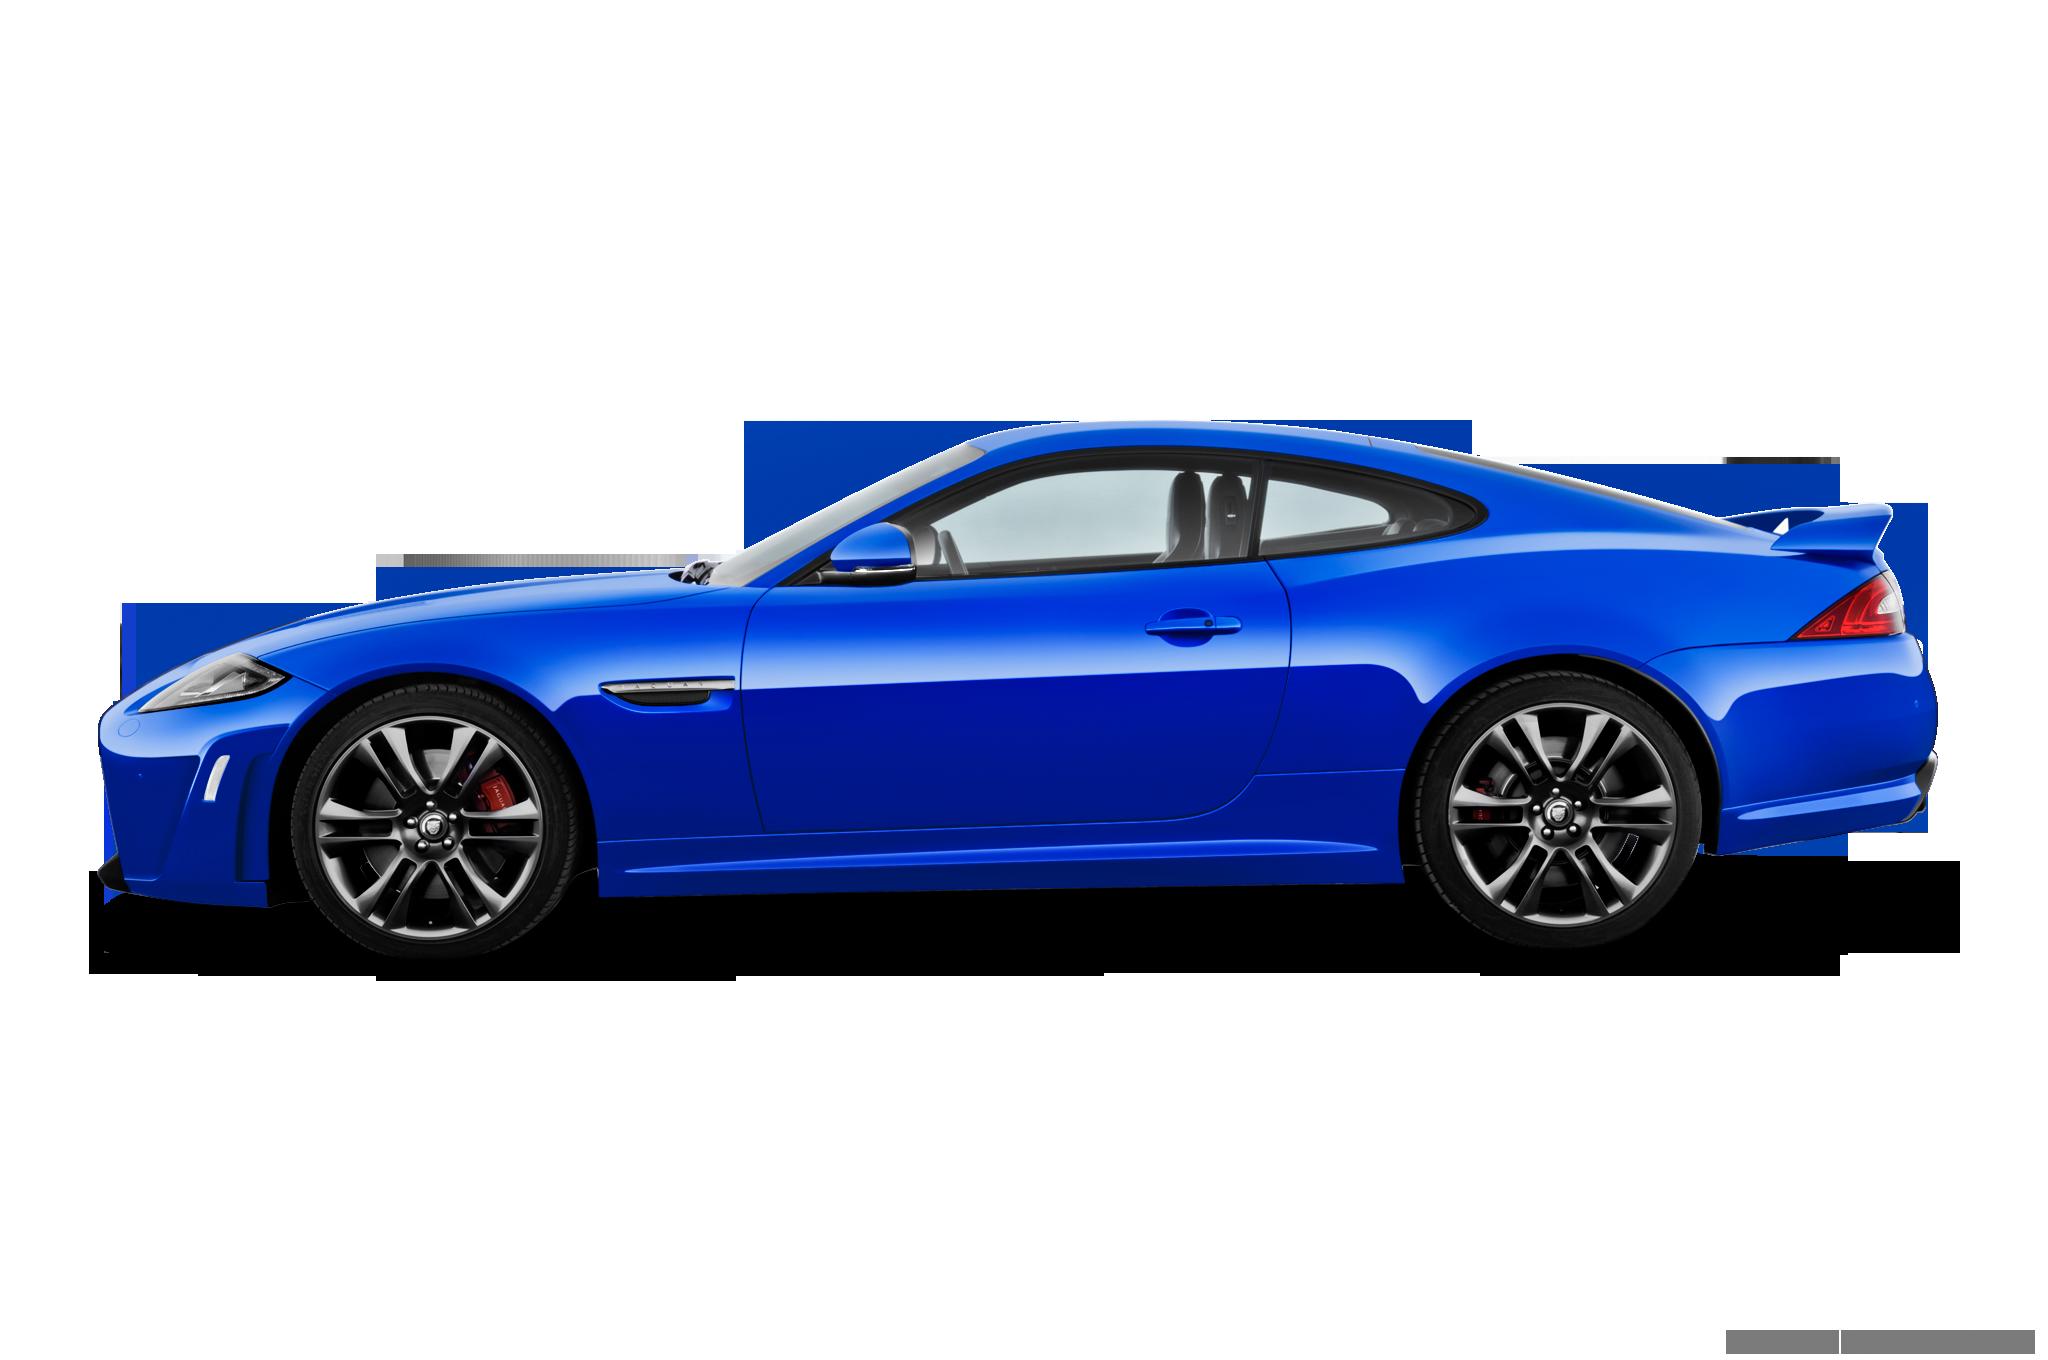 2013 Jaguar XK Base Price Drops to $79,875, XKR Drop-Top ...